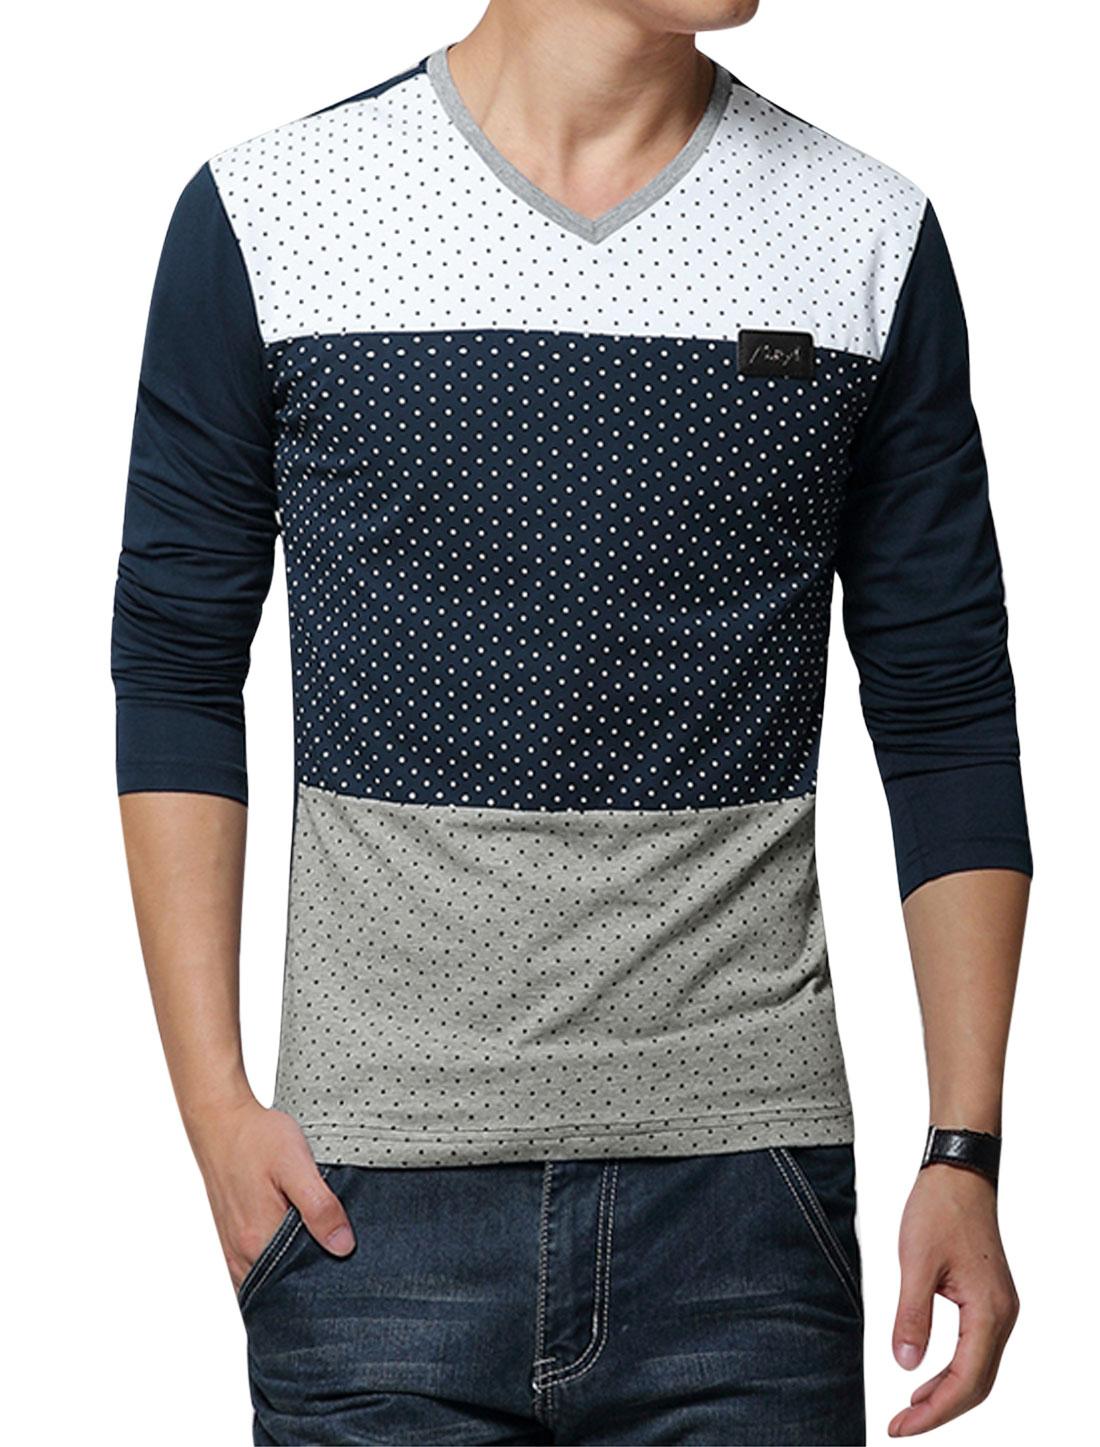 Men Long Sleeve Dots Print Contrast Color T Shirt Navy Blue White M